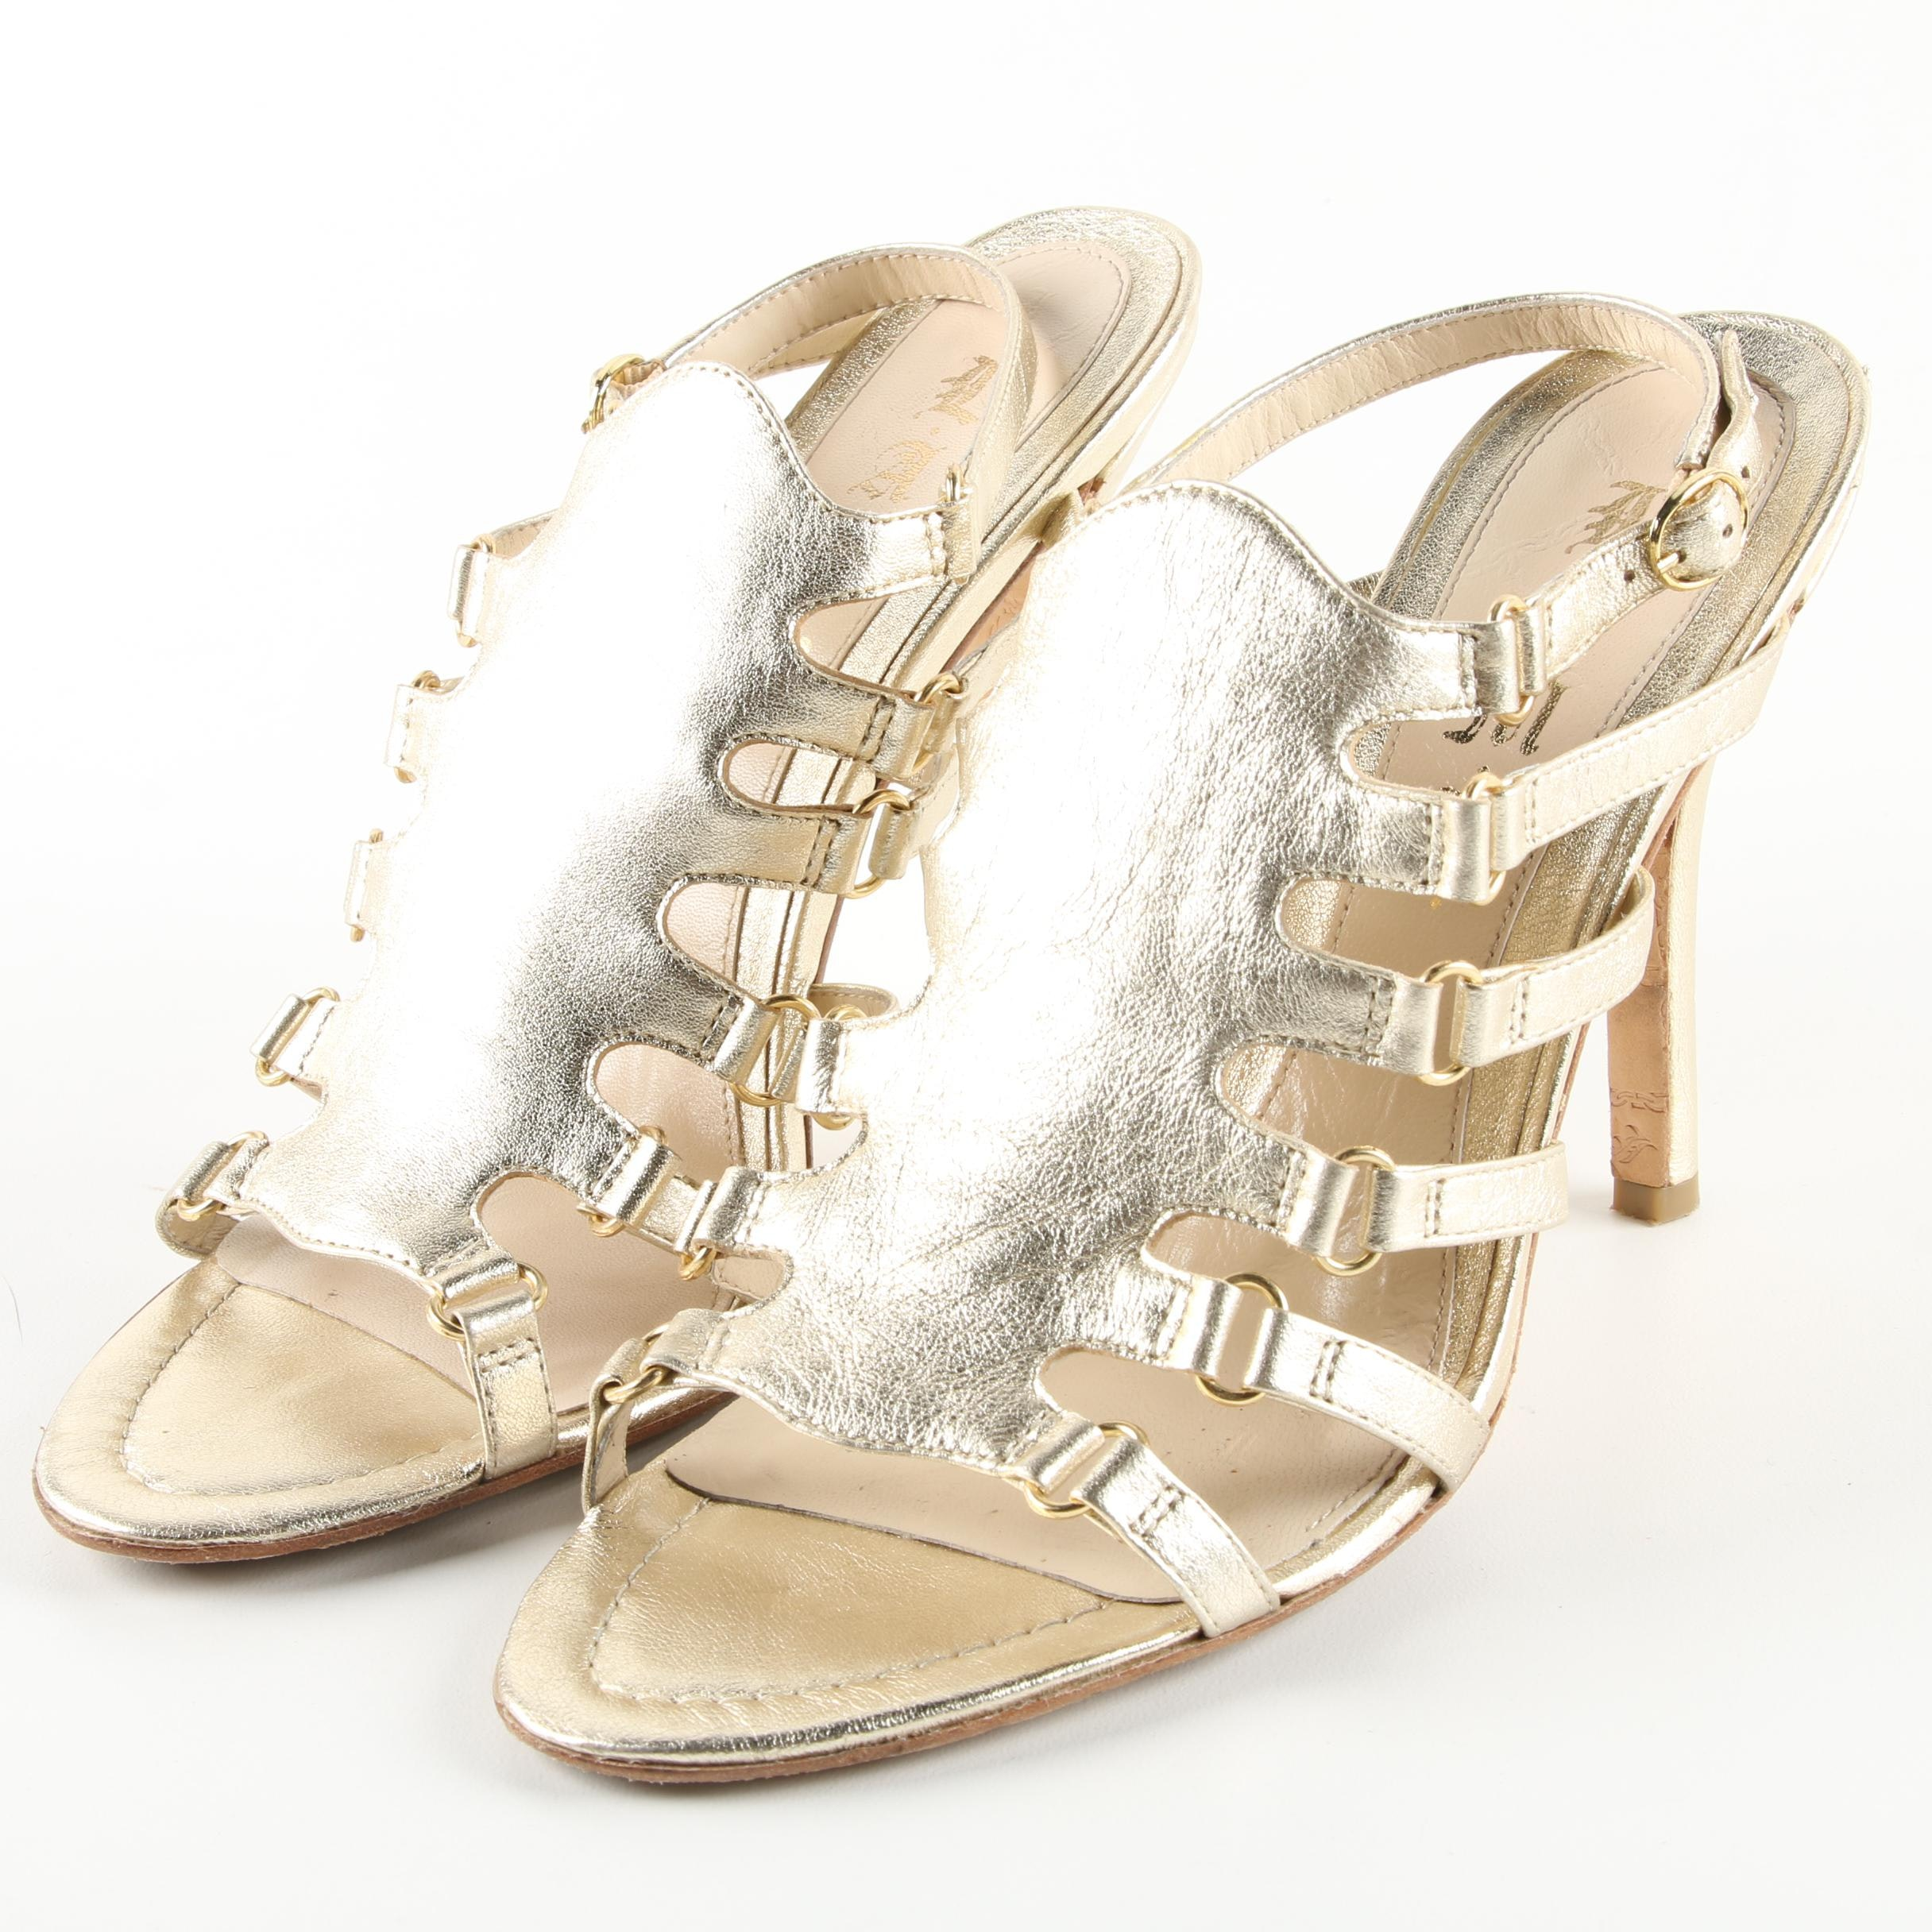 Women's L.A.M.B. Goldy Metallic Platinum Leather High-Heeled Sandals